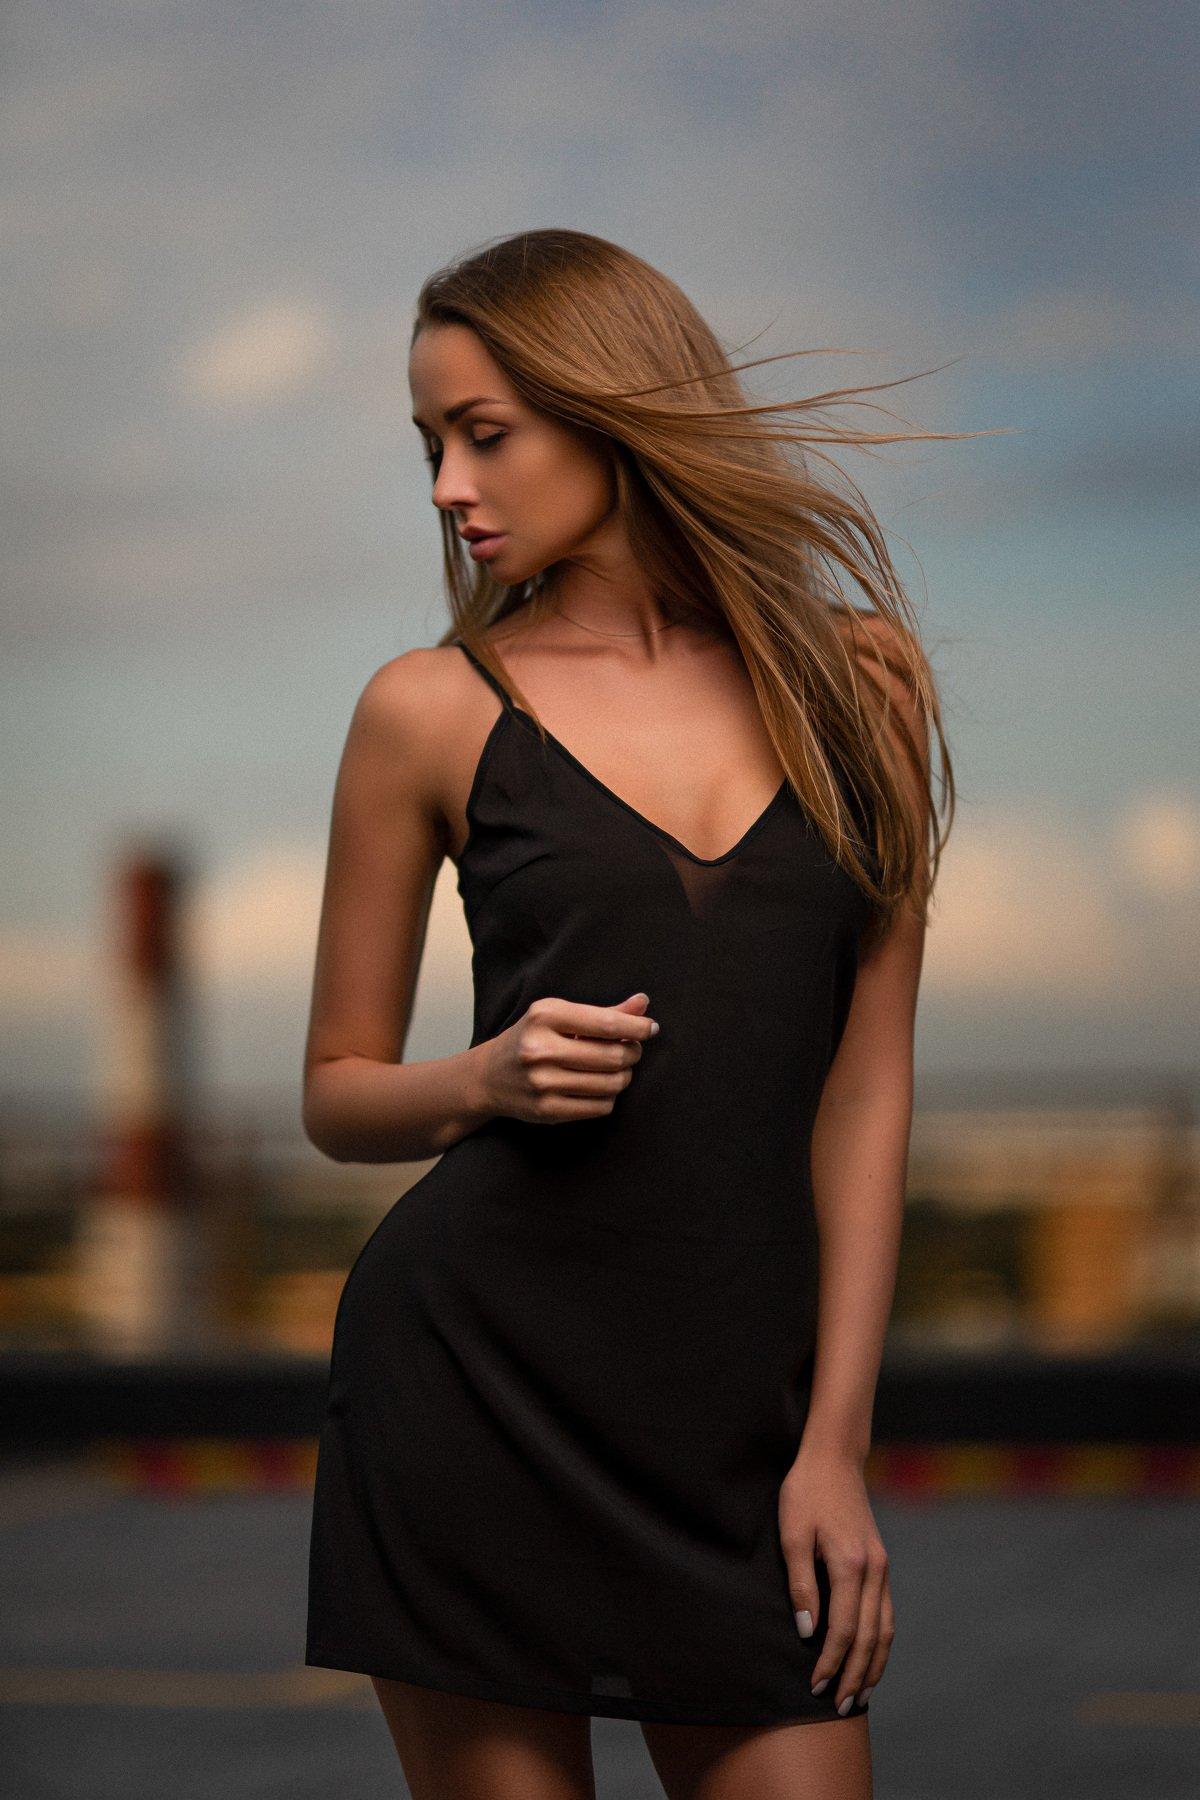 russian girl street godox russia, Пистолетов Илья